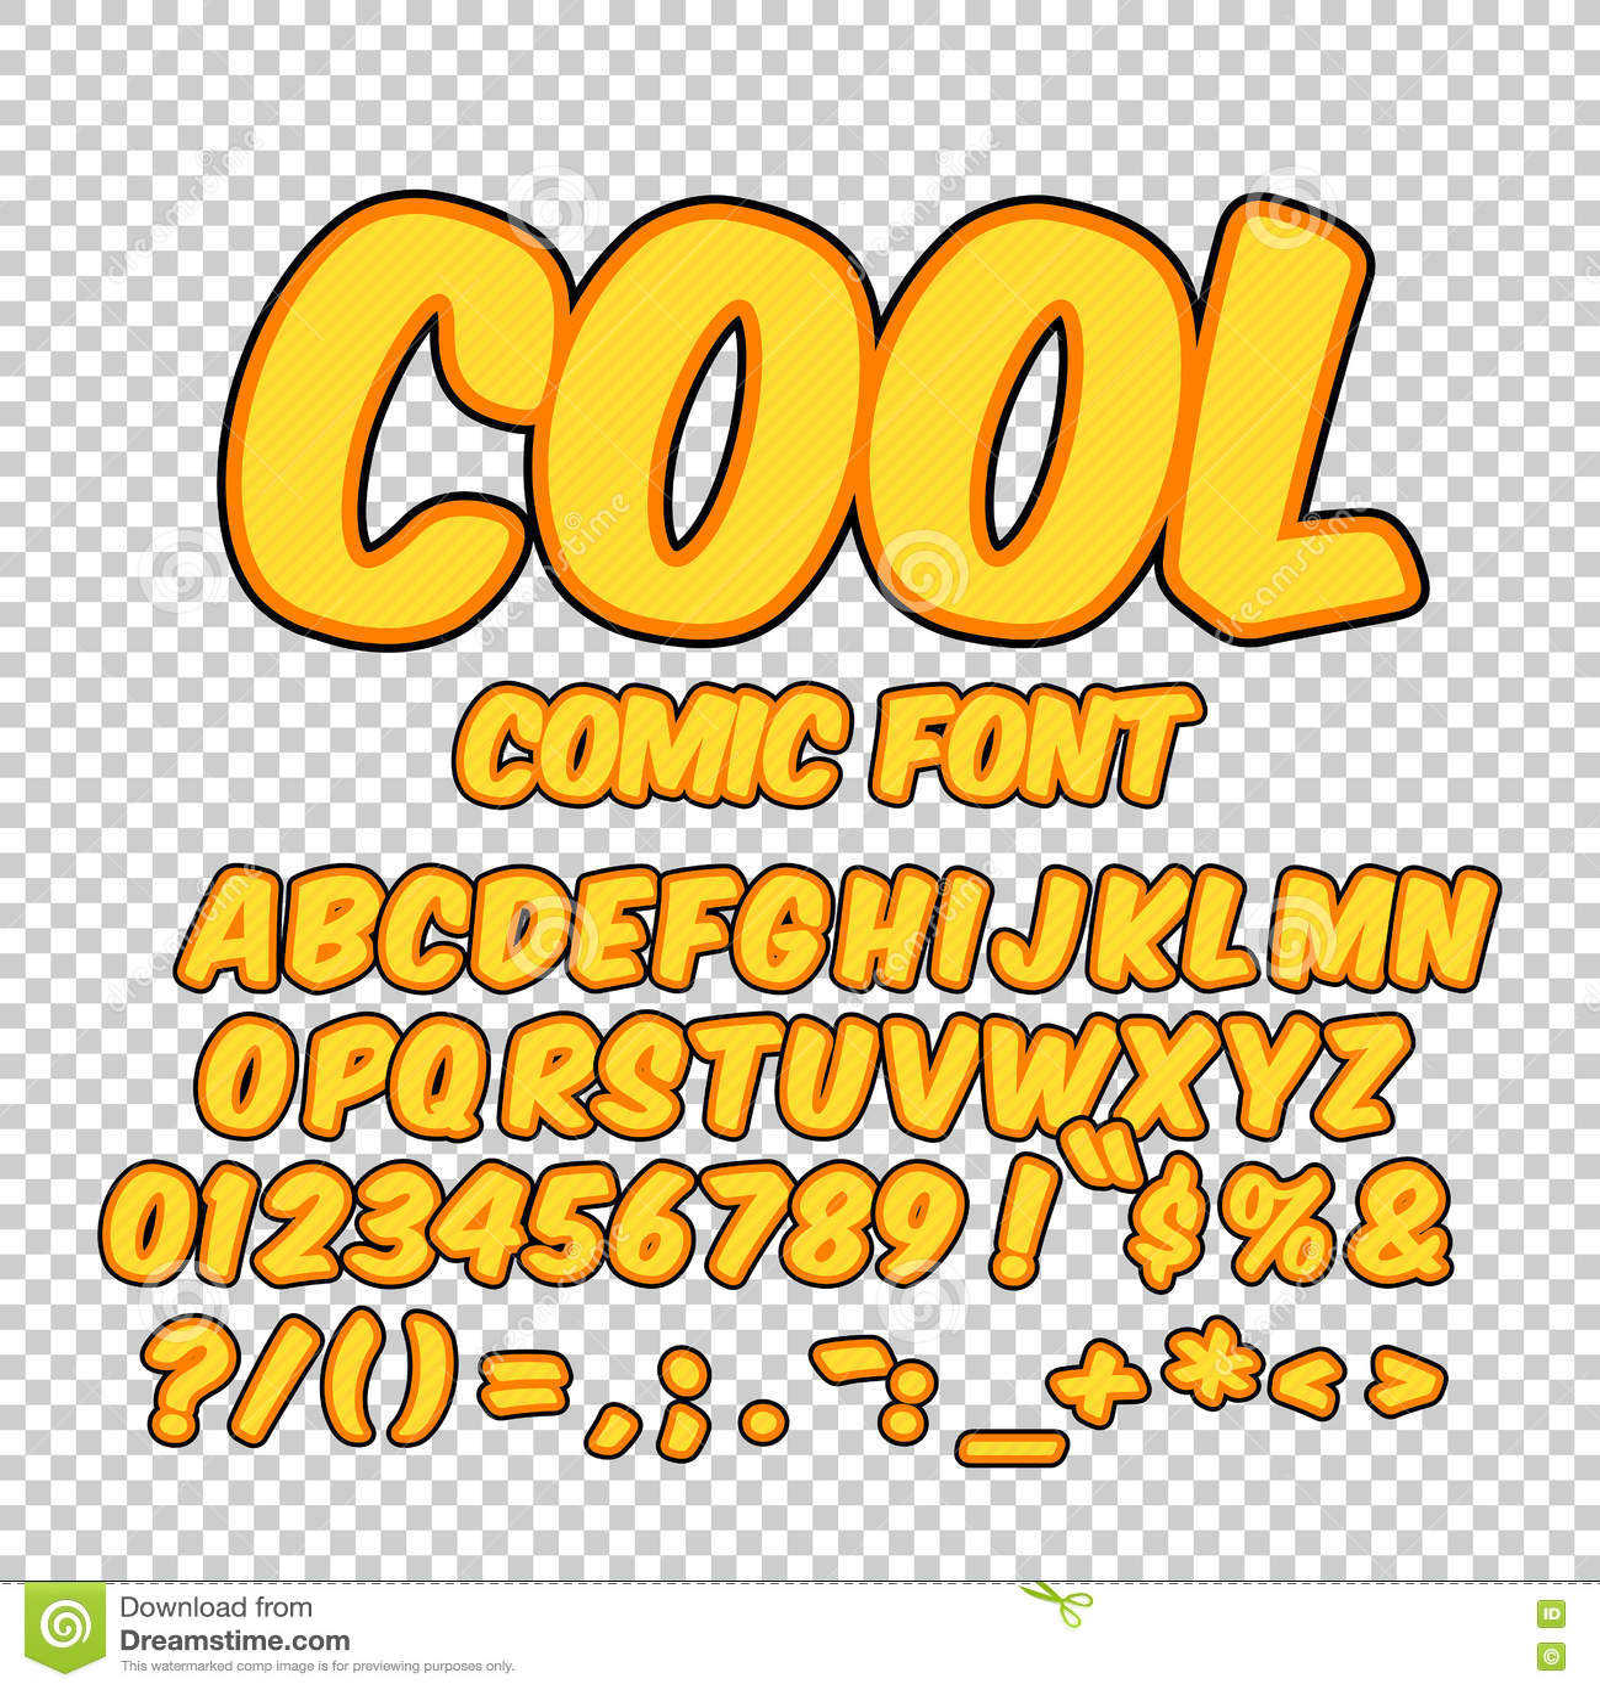 Modern Alphabet Letters Wall Decor Pattern - Art & Wall Decor ...